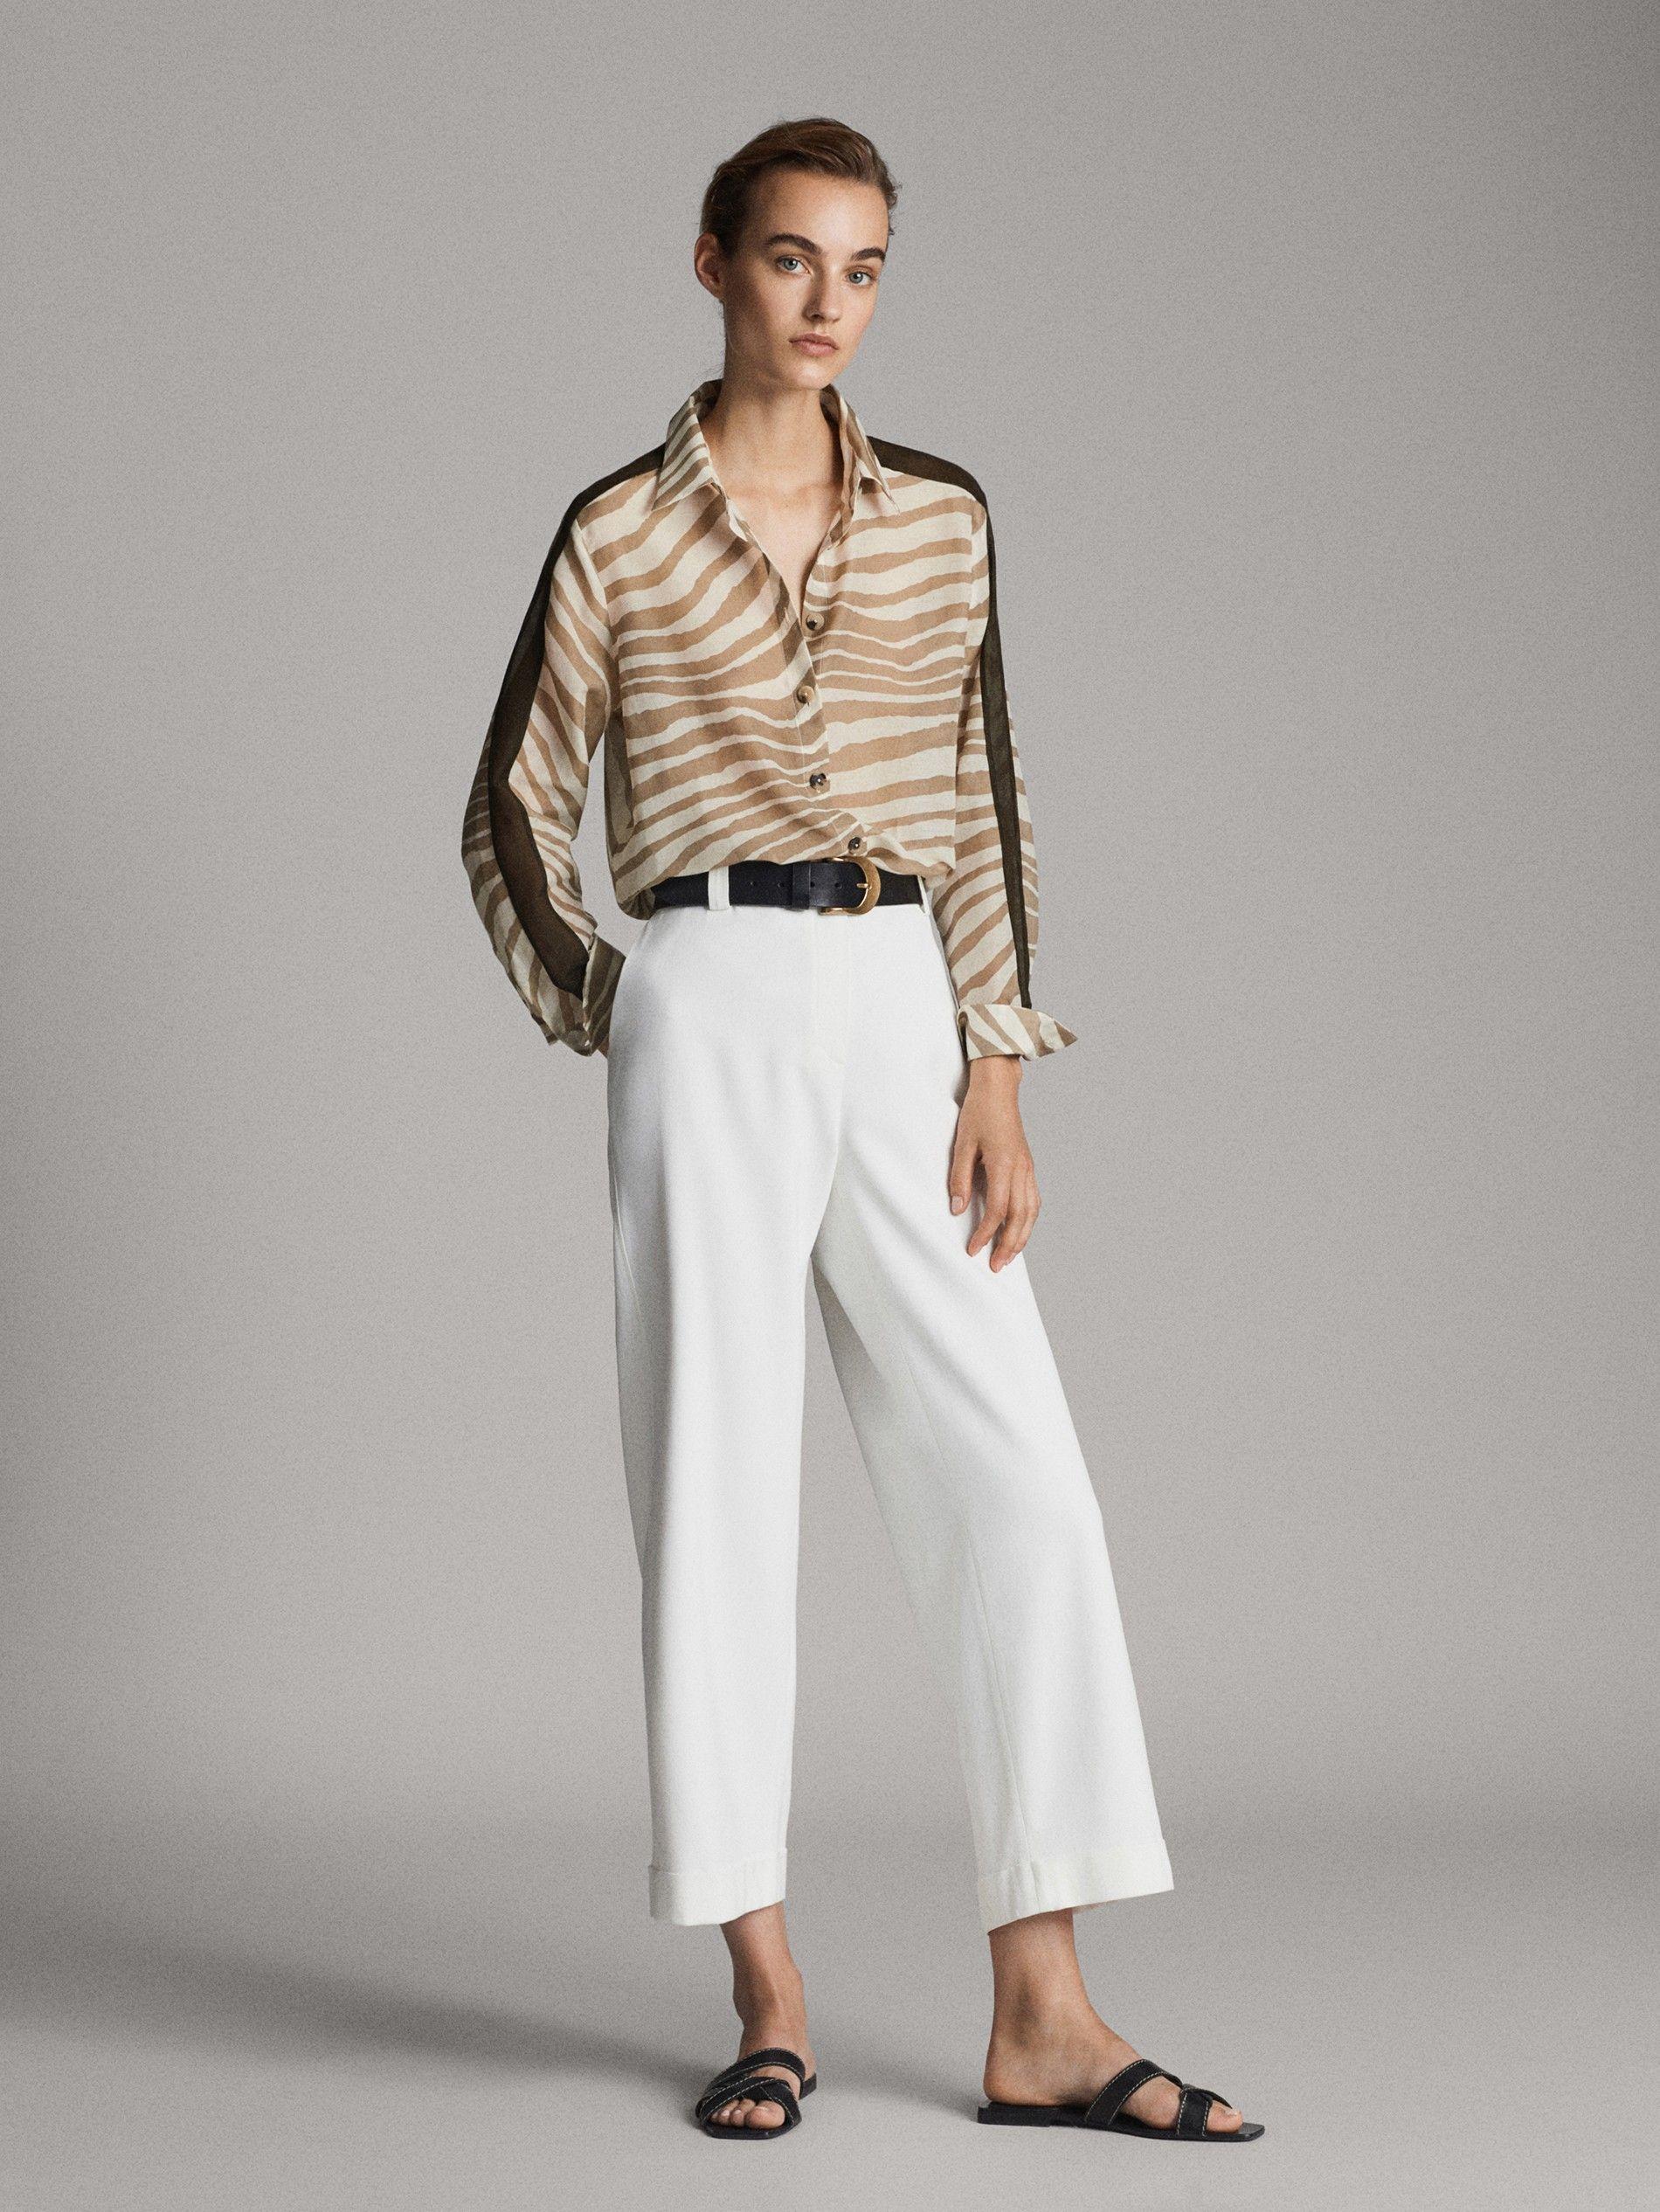 Cotton And Silk Zebra Print Shirt With Sleeve Taping Women Massimo Dutti Printed Shirts Current Fashion Trends Massimo Dutti Women